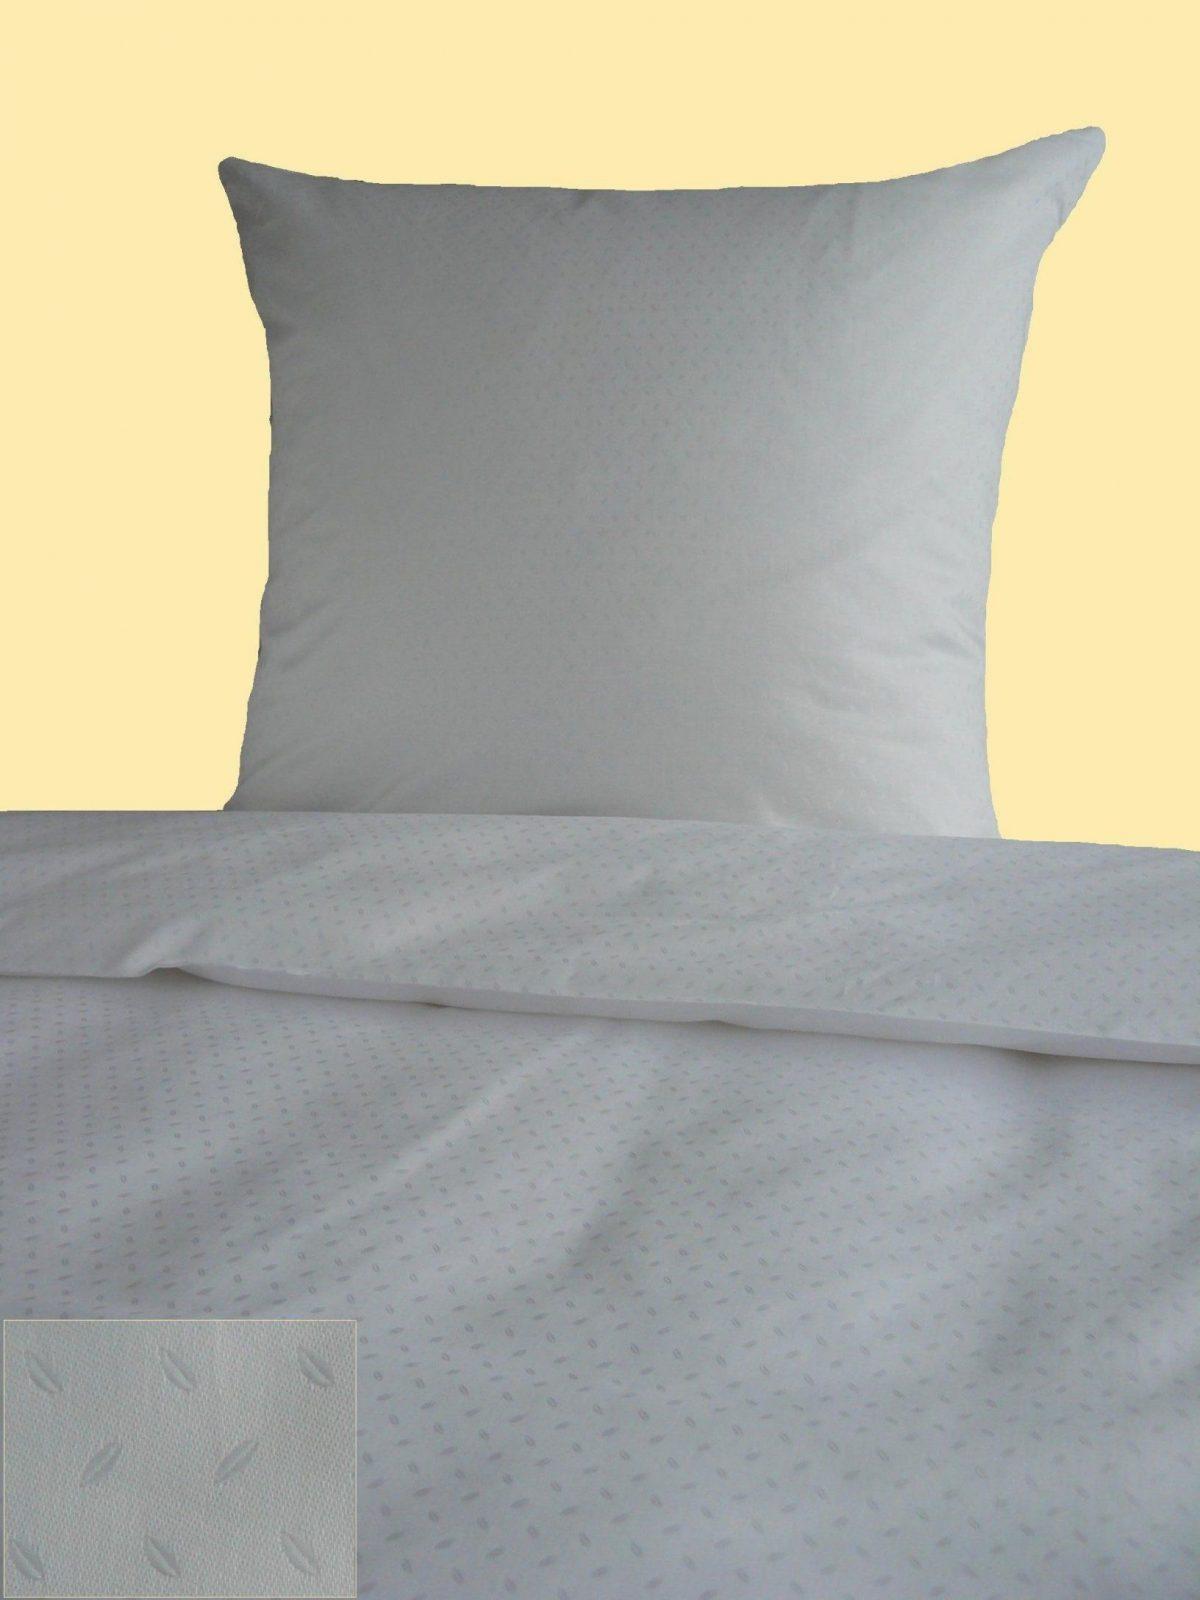 Bettwäsche Nähen Hotelverschluss E Book Kissen Mit Hotelverschluss